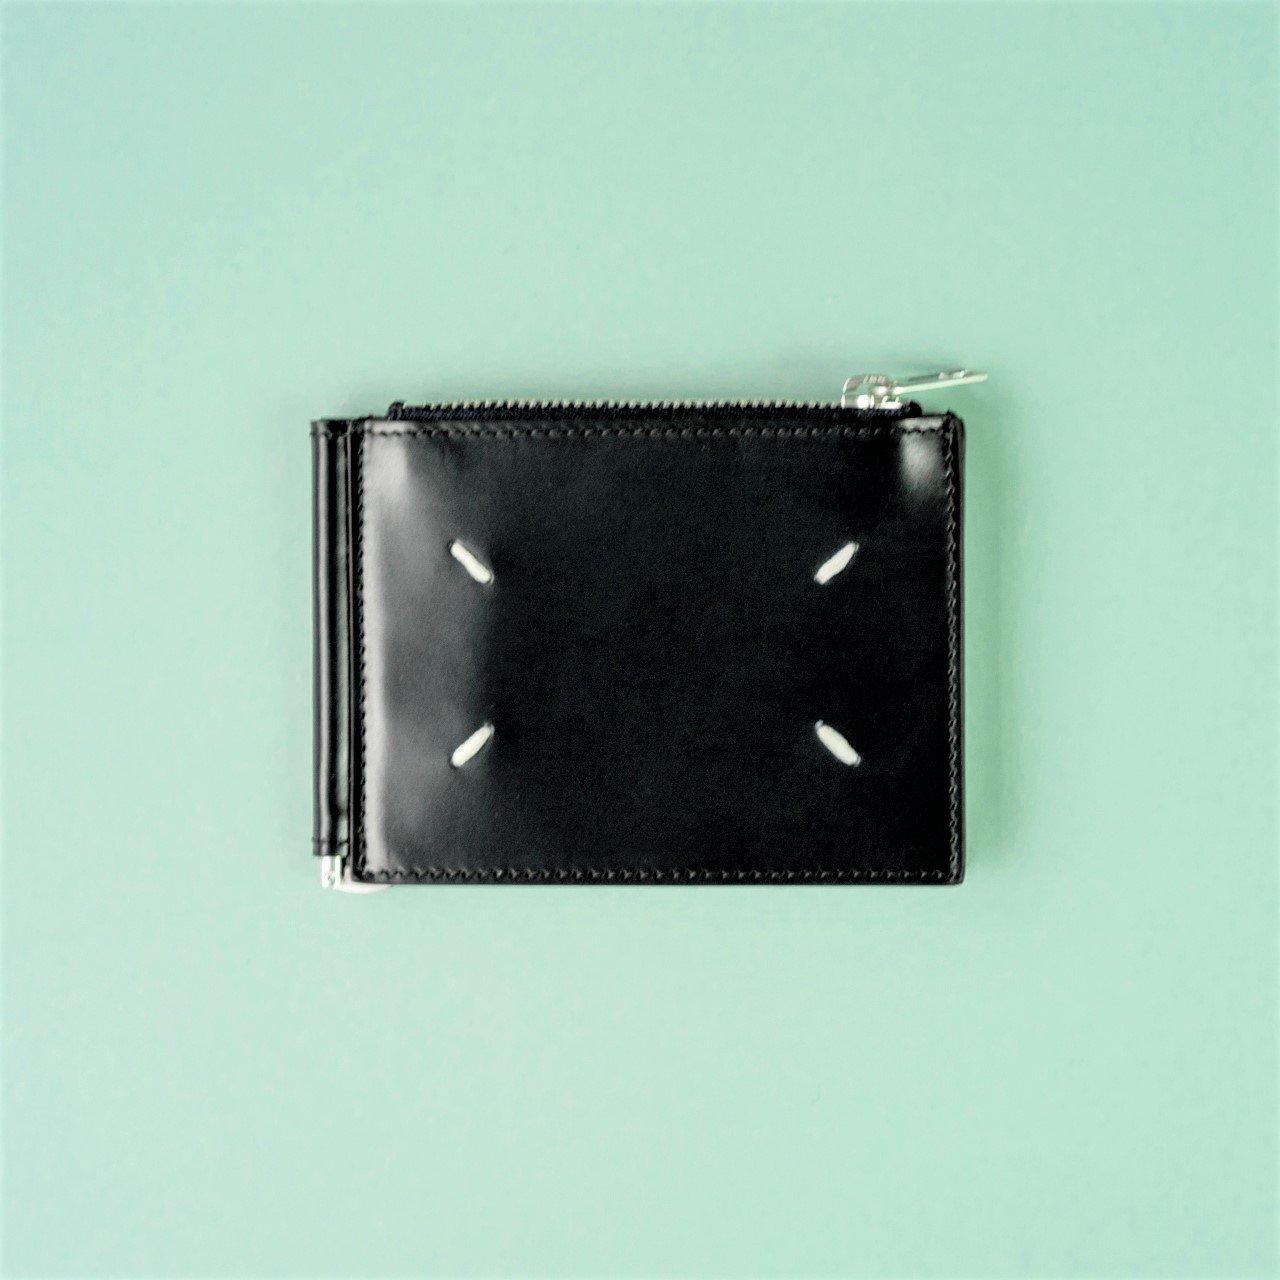 Maison Margiela PARIS <BR>マネークリップ付きウォレット<BR>ブラック